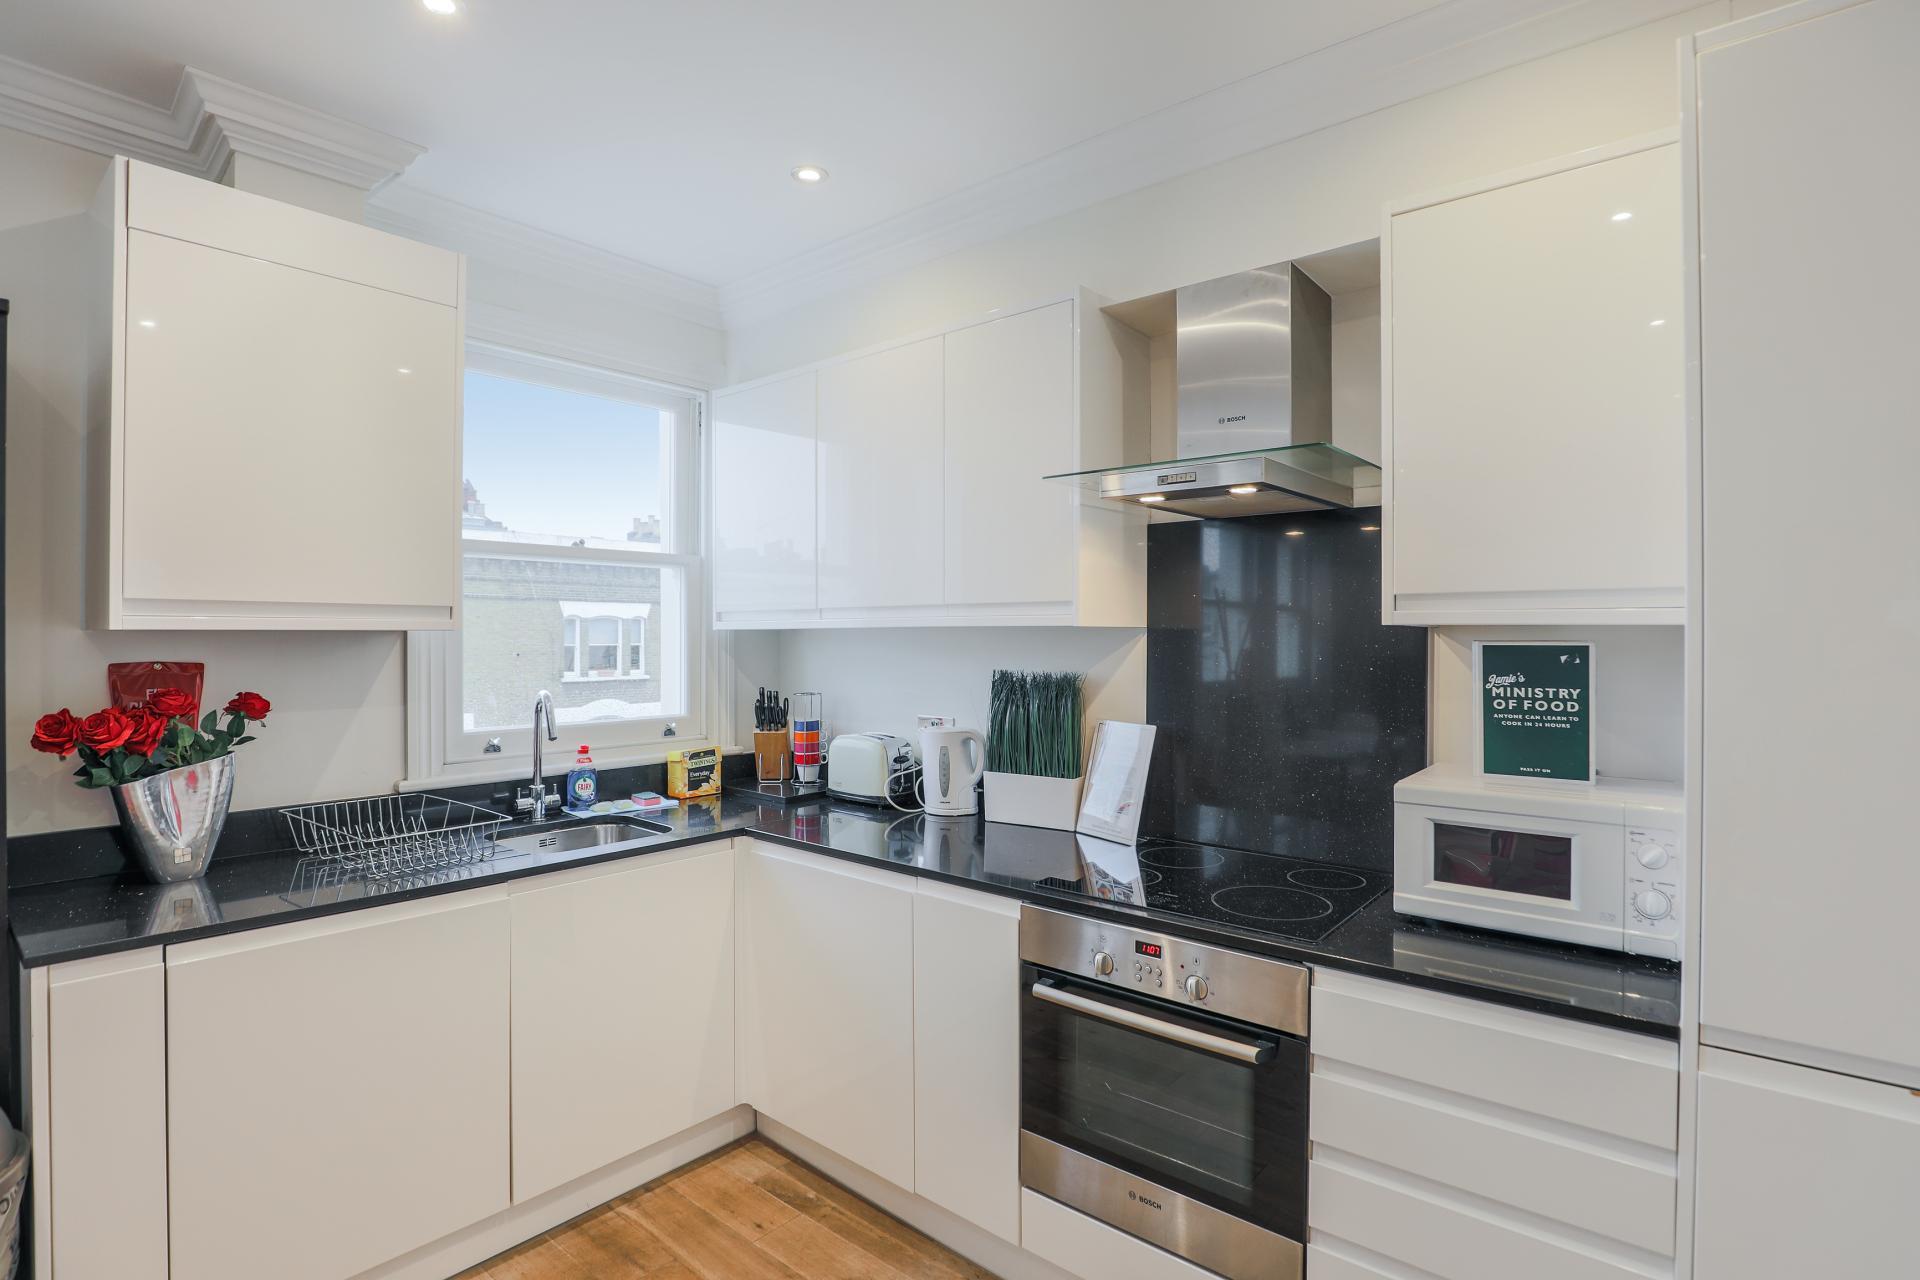 Kitchen at Notting Hill Ladbroke Grove Apartments, Ladbroke Grove, London - Citybase Apartments